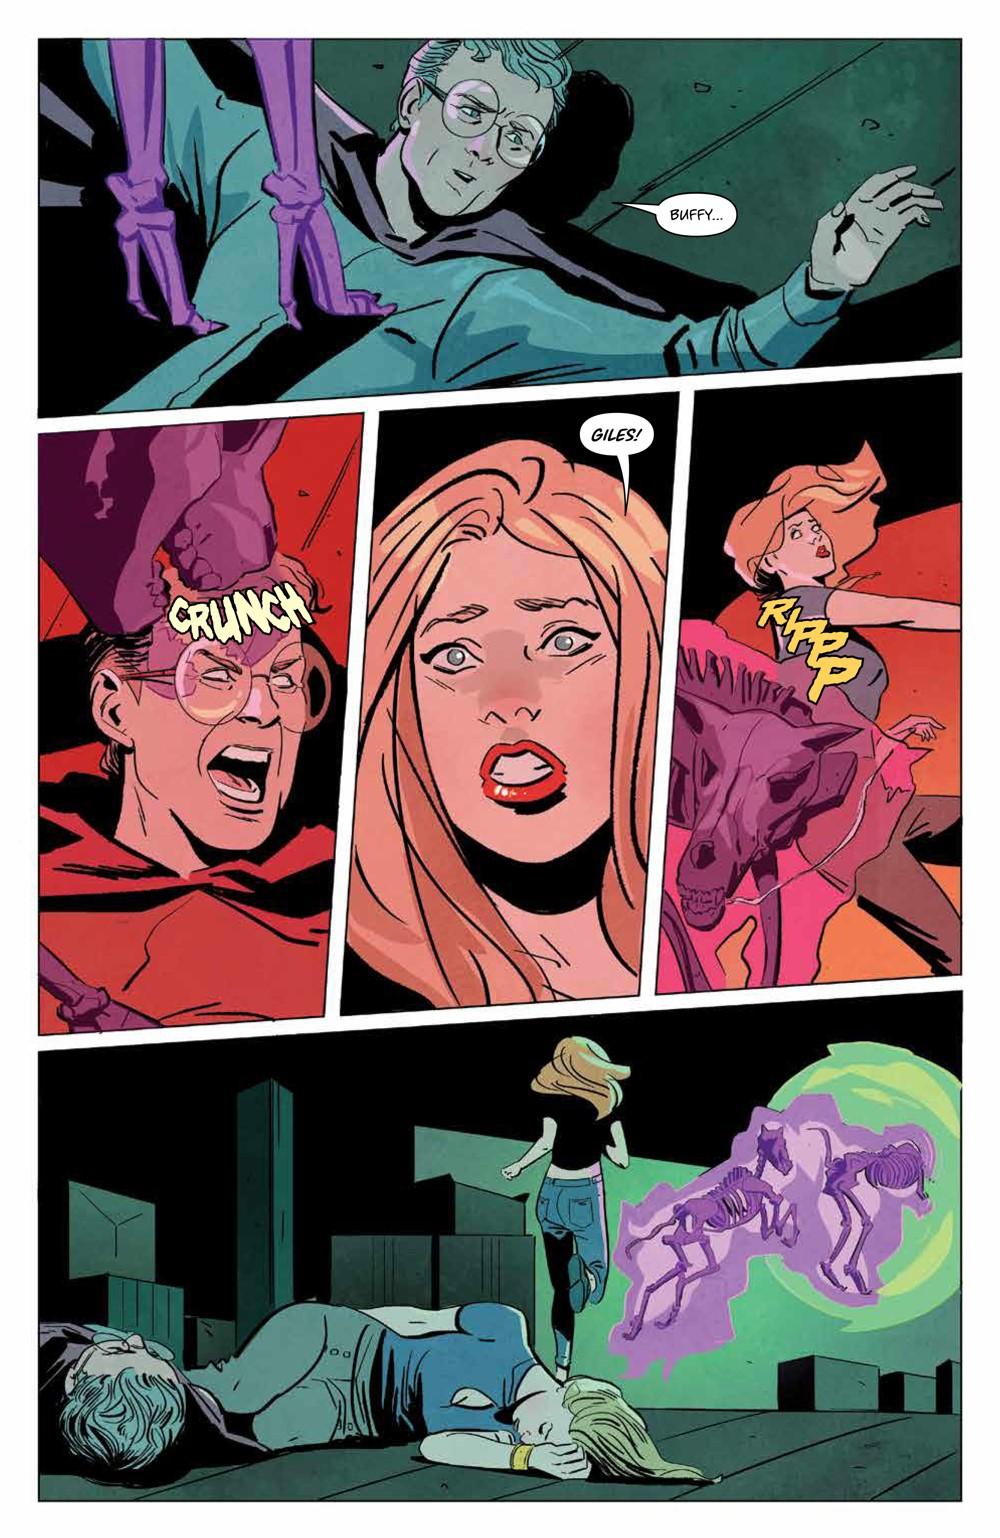 Buffy_030_PRESS_6 ComicList Previews: BUFFY THE VAMPIRE SLAYER #30